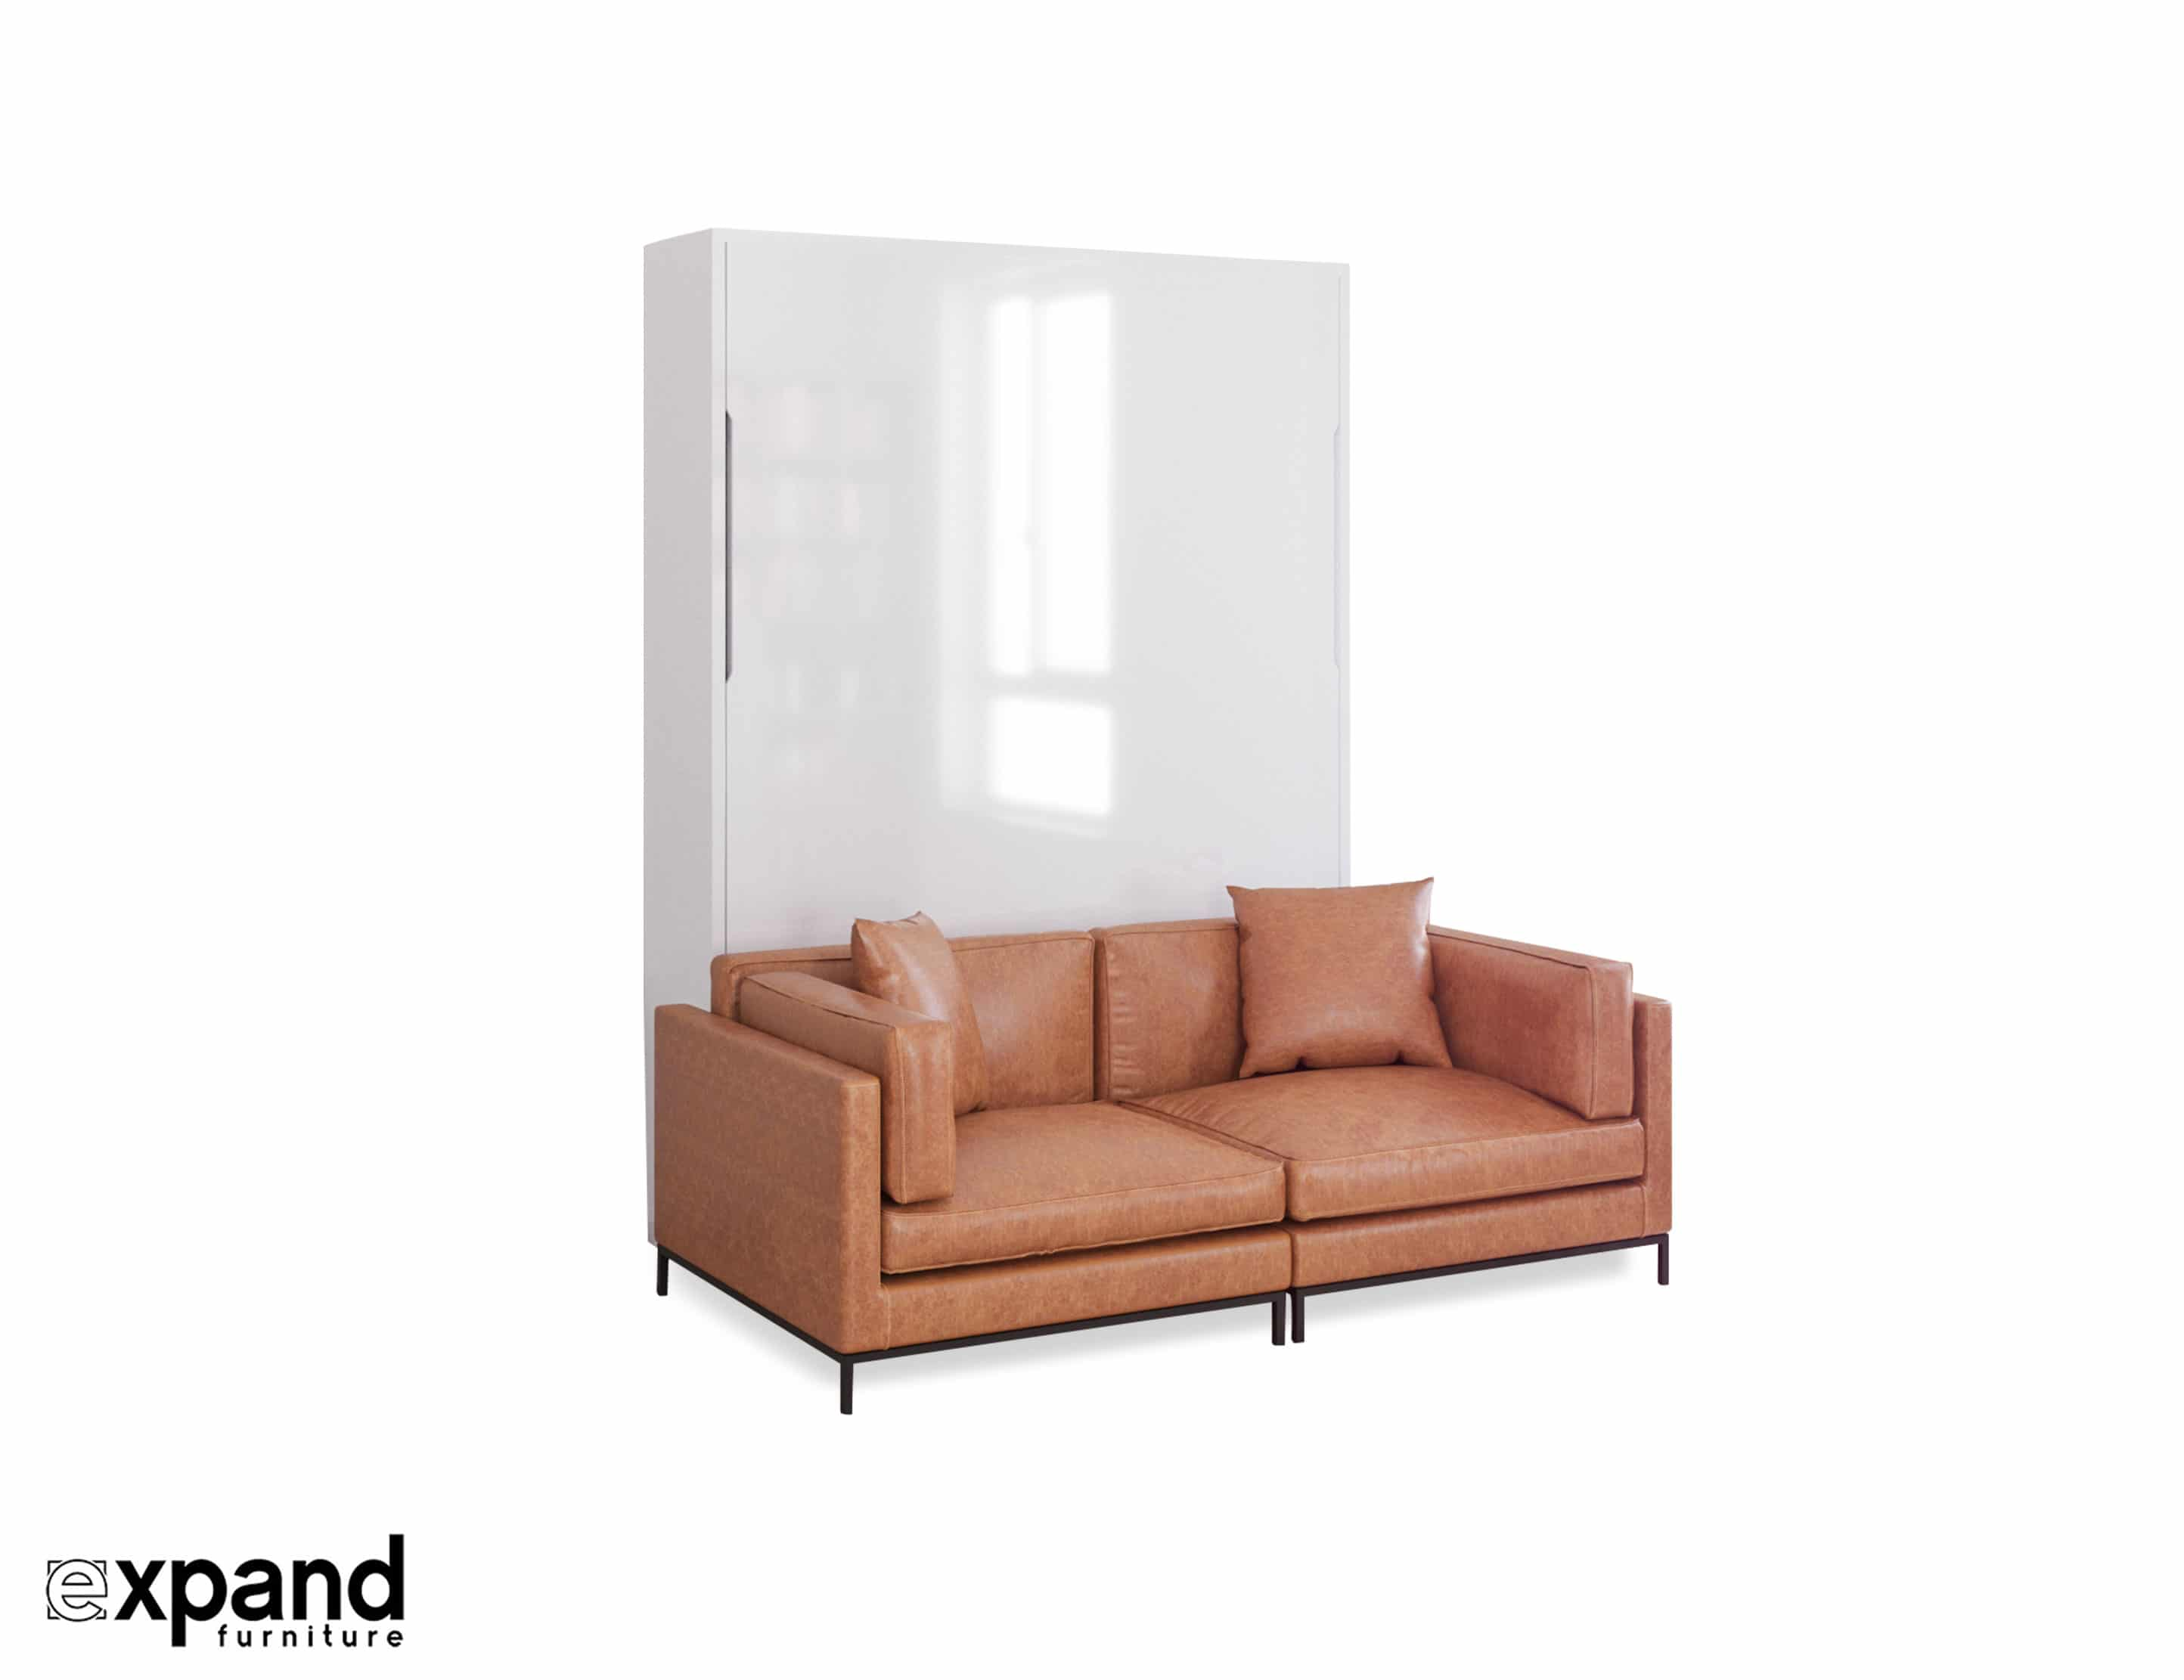 Incredible Murphysofa Migliore 2 Seat Sofa In Leather Or Microfiber Evergreenethics Interior Chair Design Evergreenethicsorg